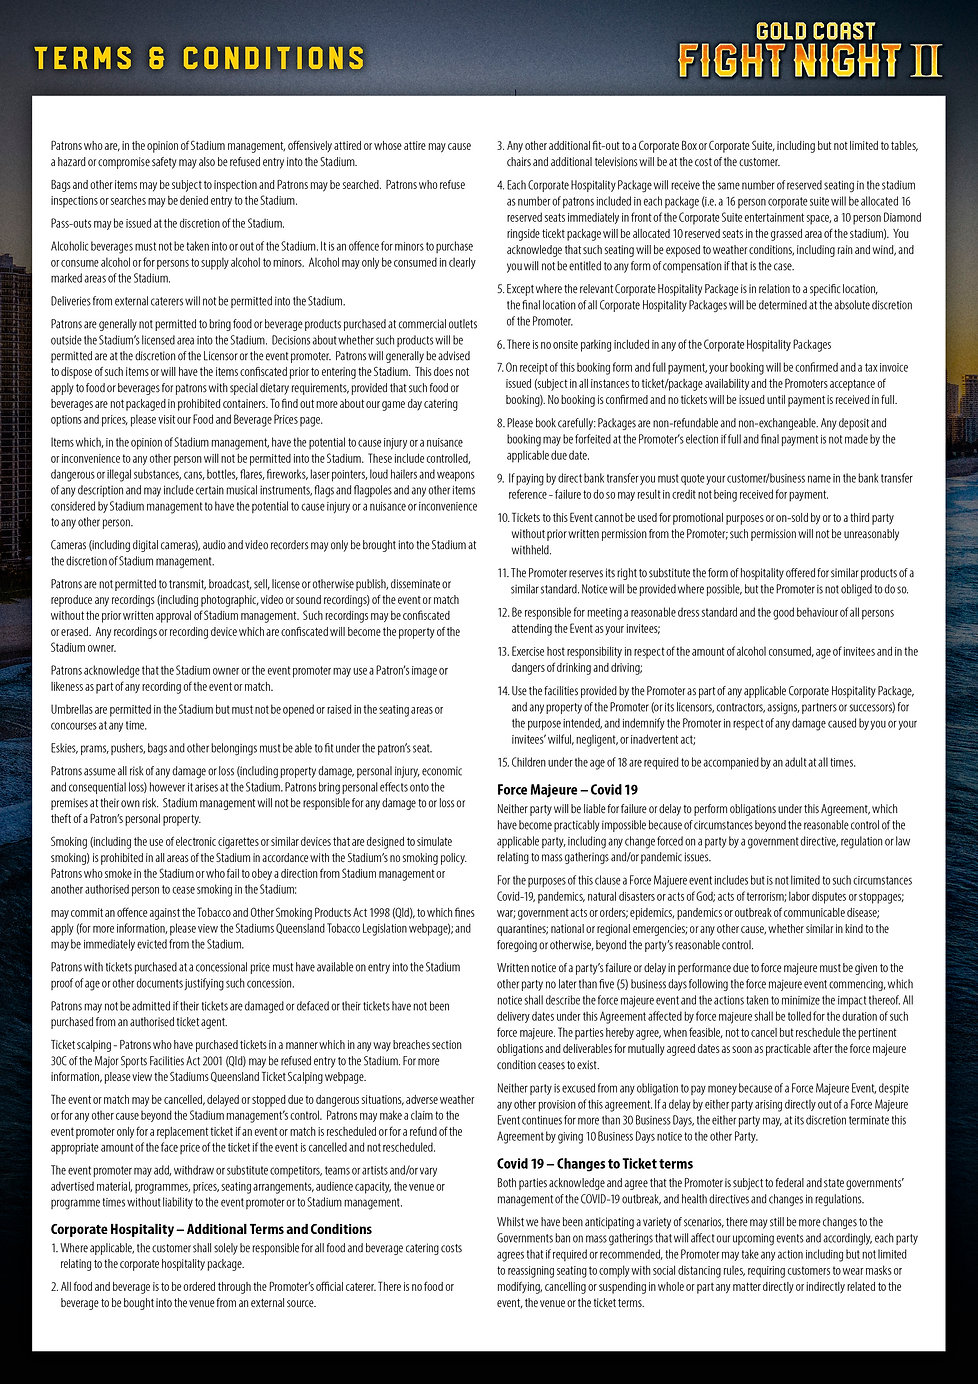 GCFN2_Corp Hosp Brochure_JPEGS6.jpg